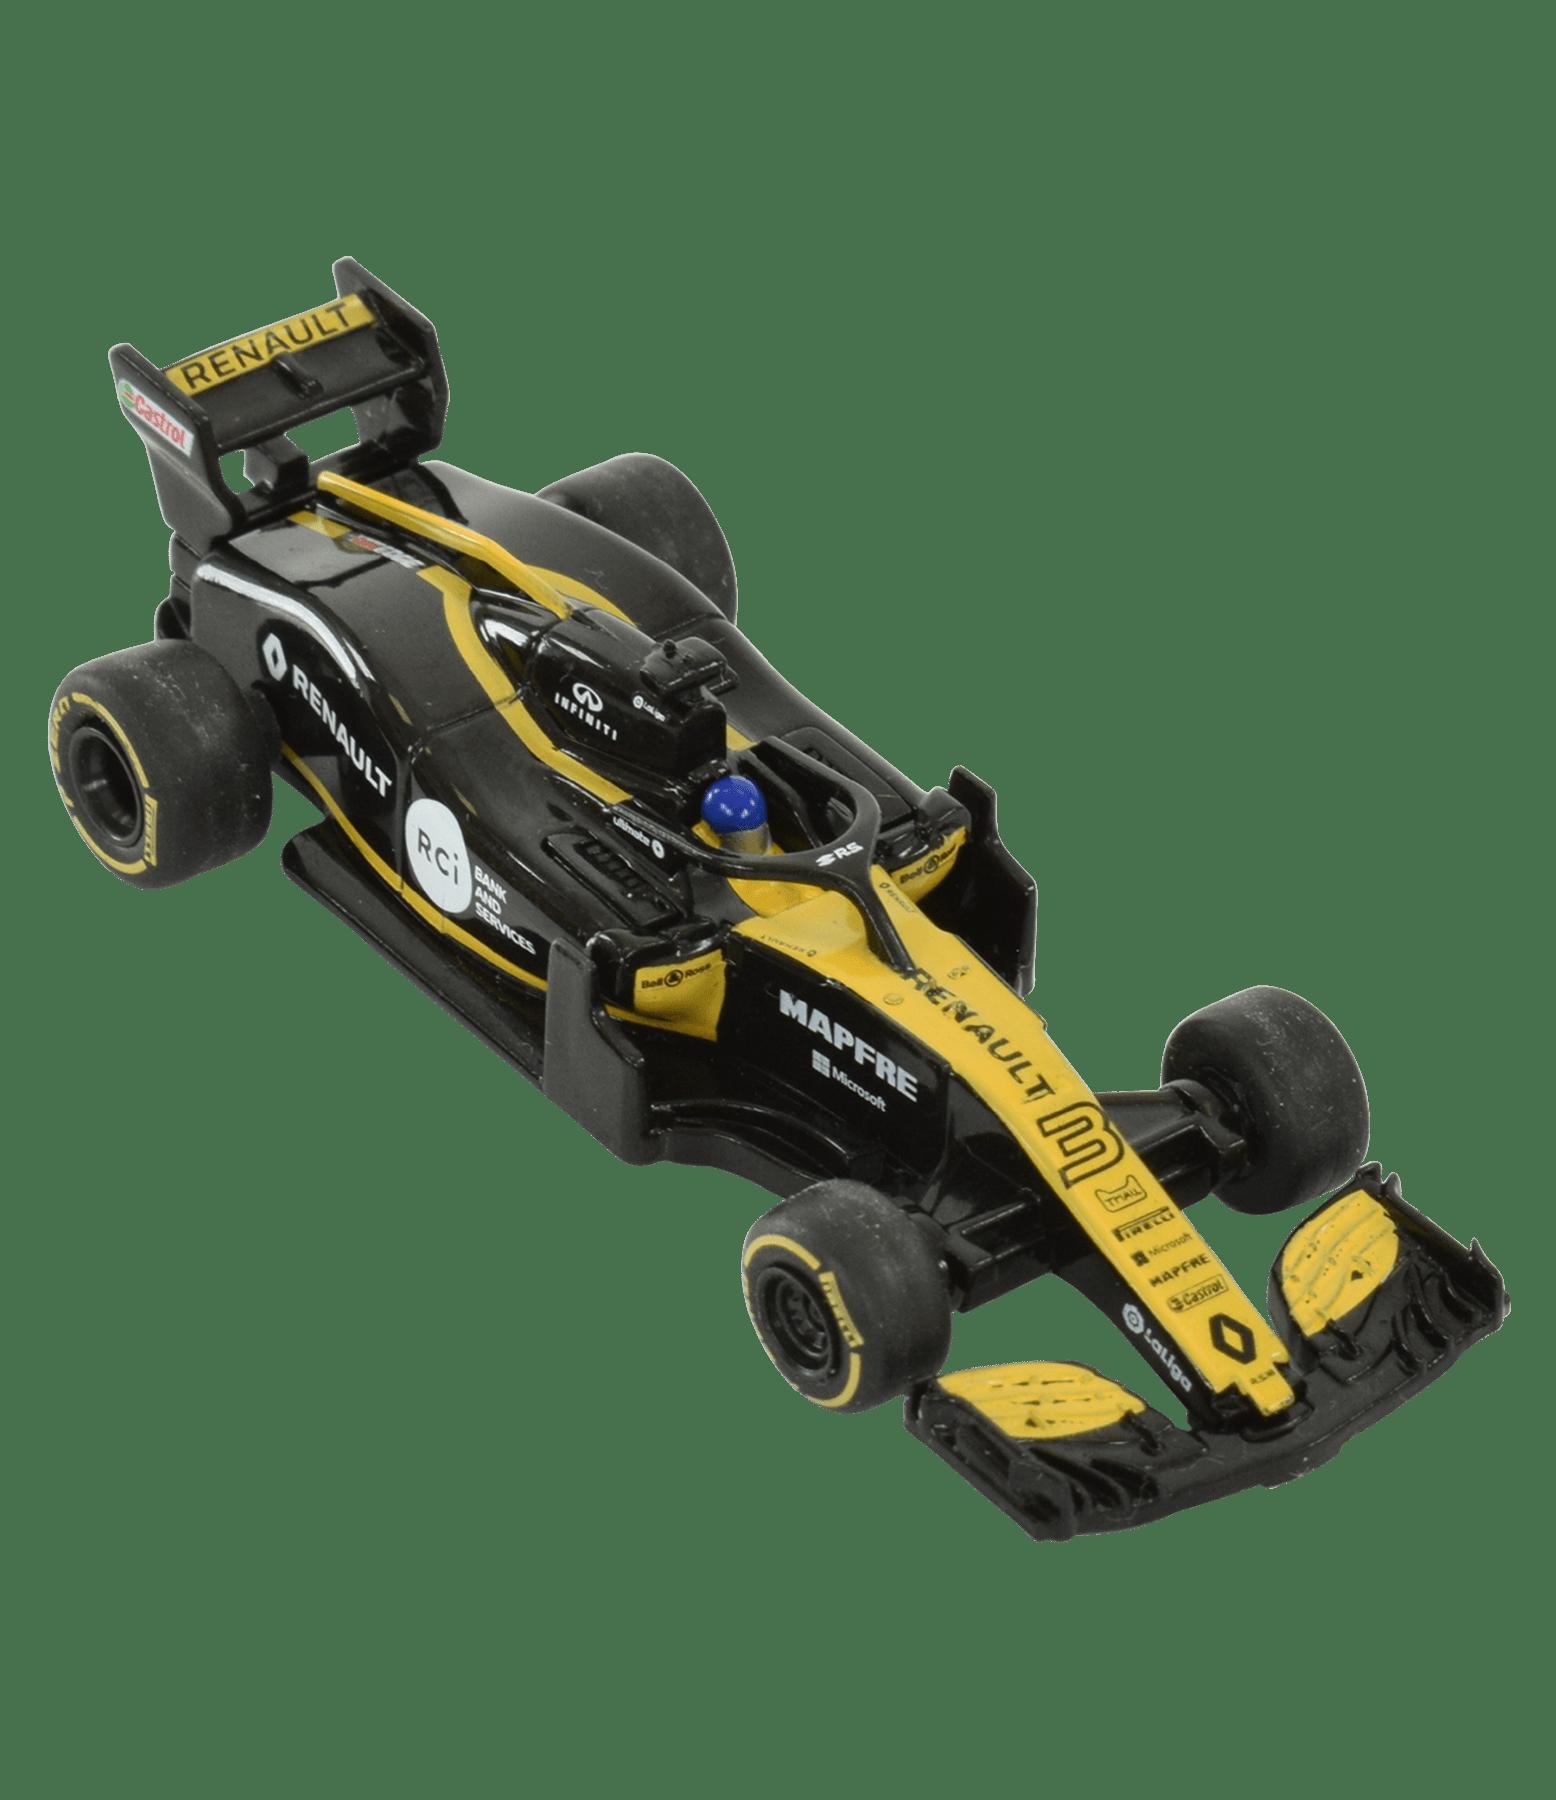 Renault Formula 1: RENAULT F1® Team 2019 R.S.19 #3 Daniel Ricciardo Model Car